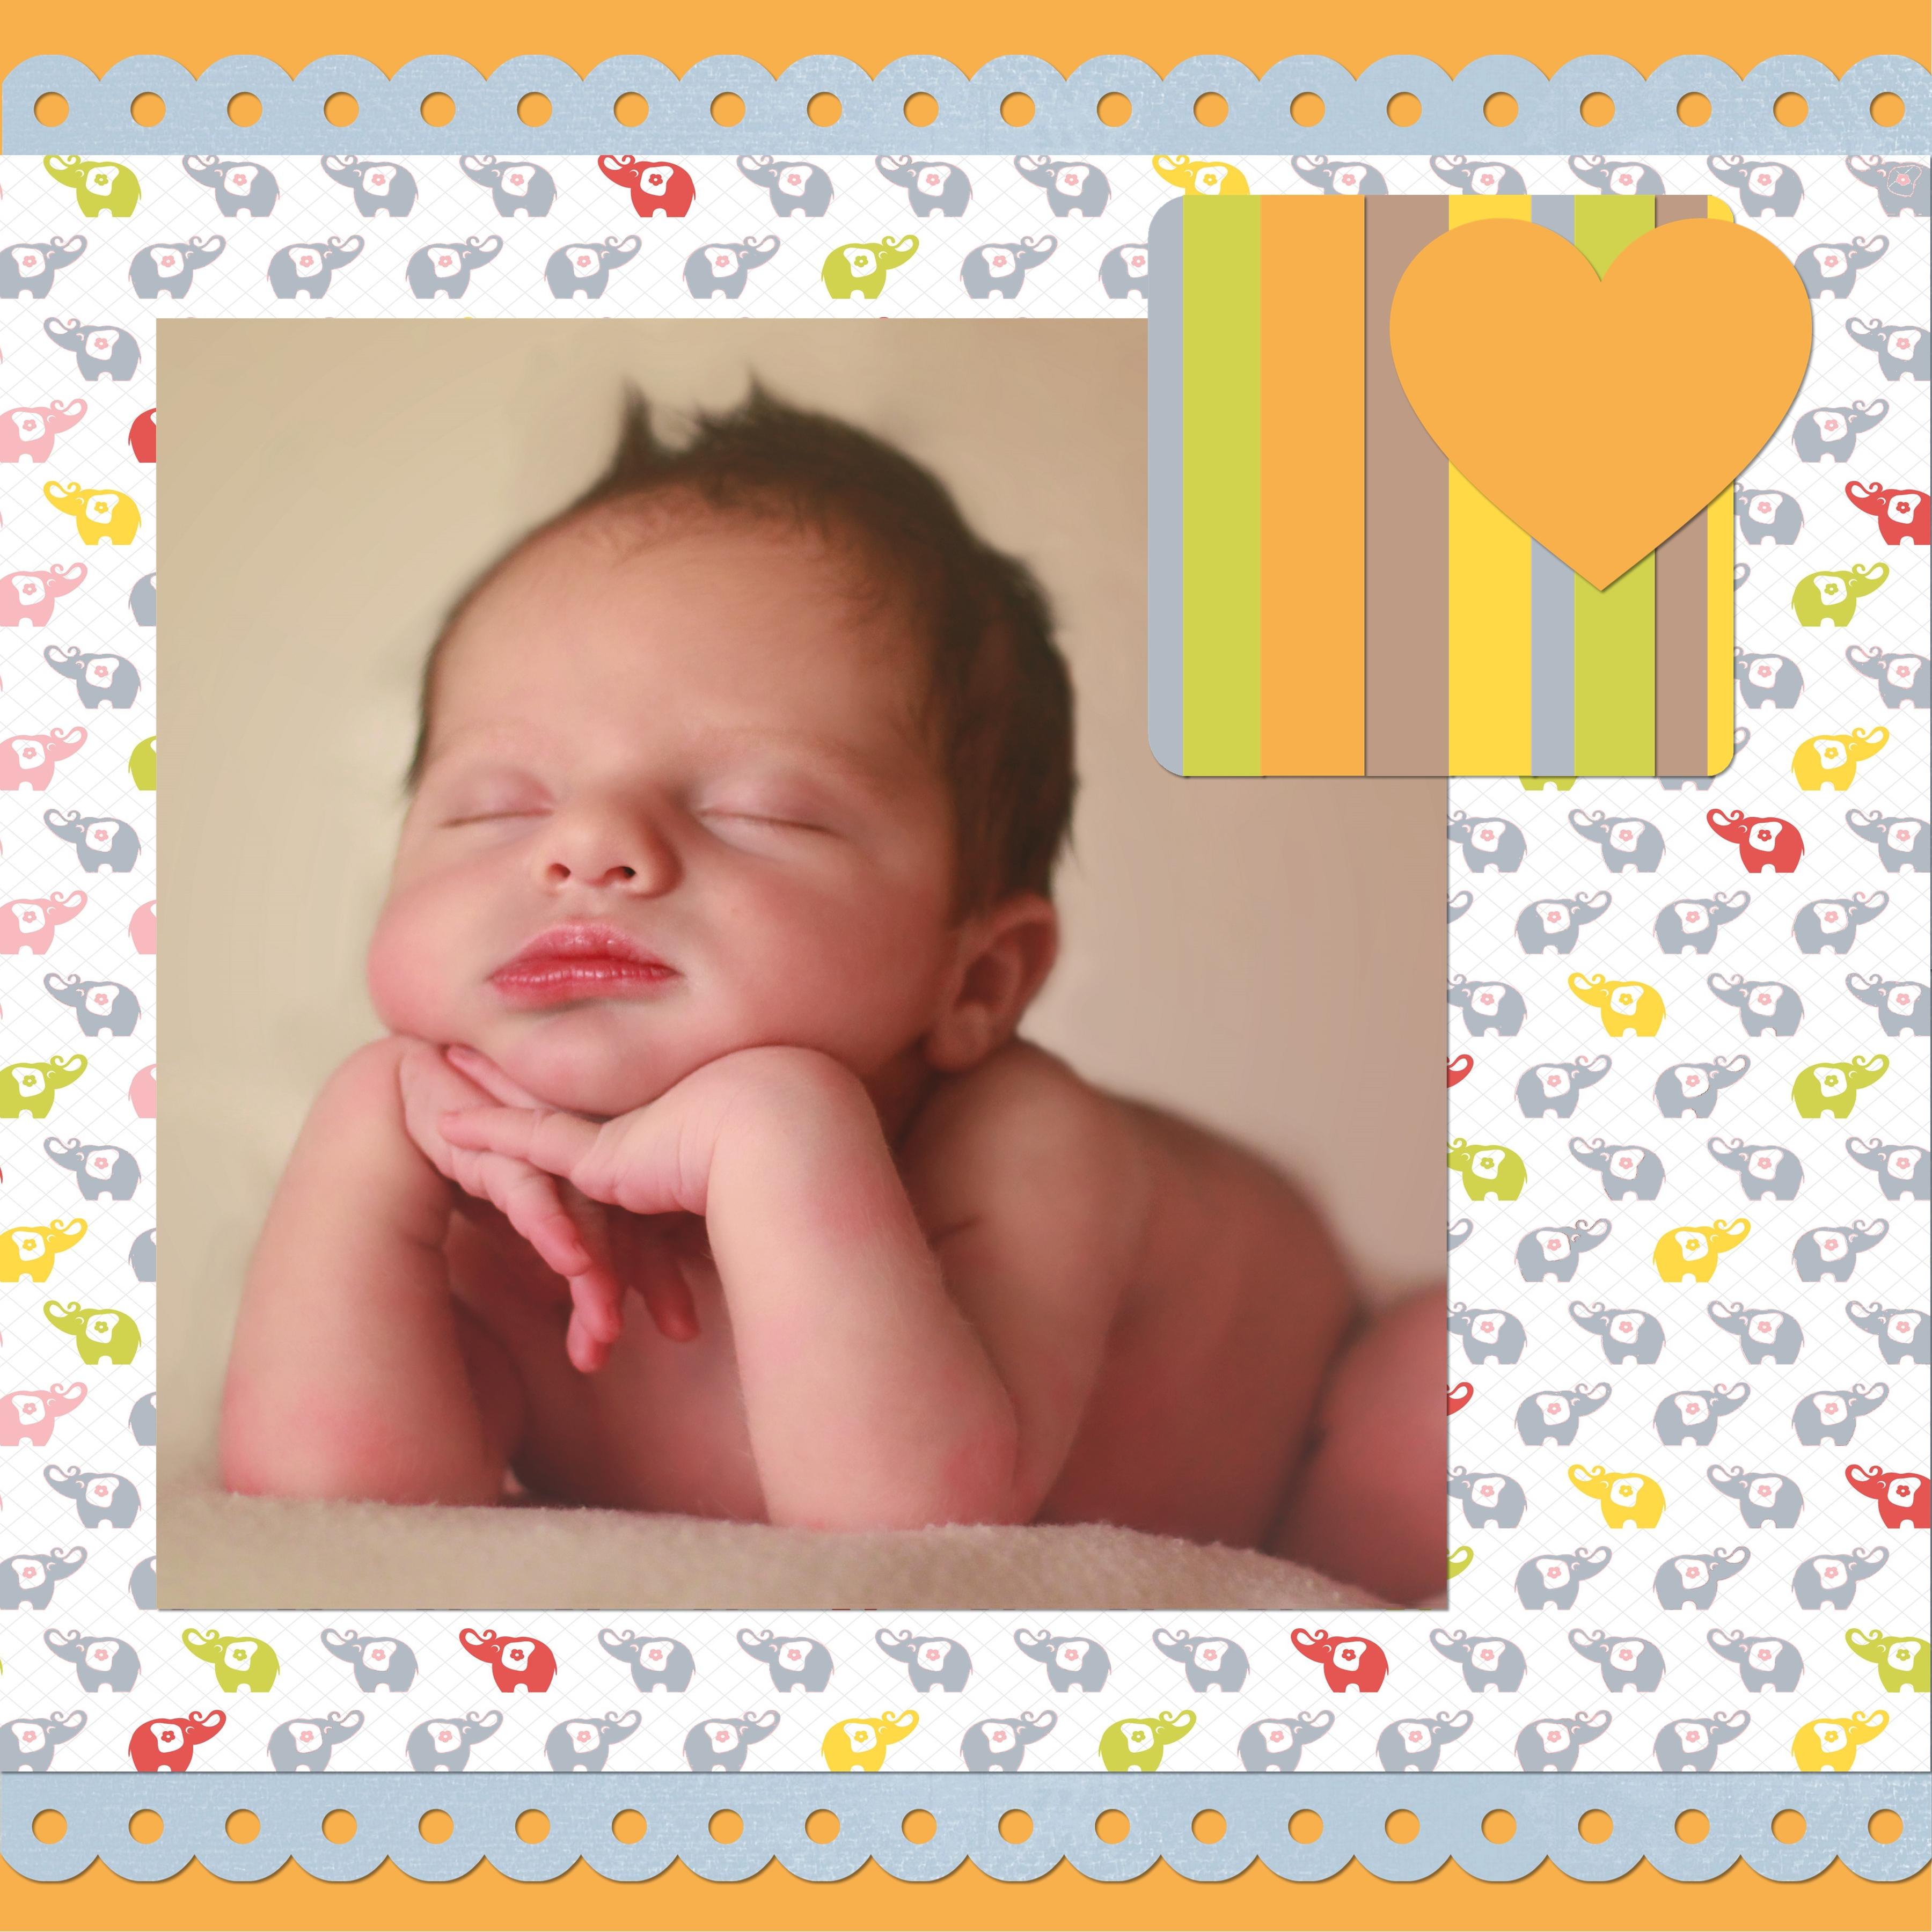 BabyBoy - Page 007.jpg